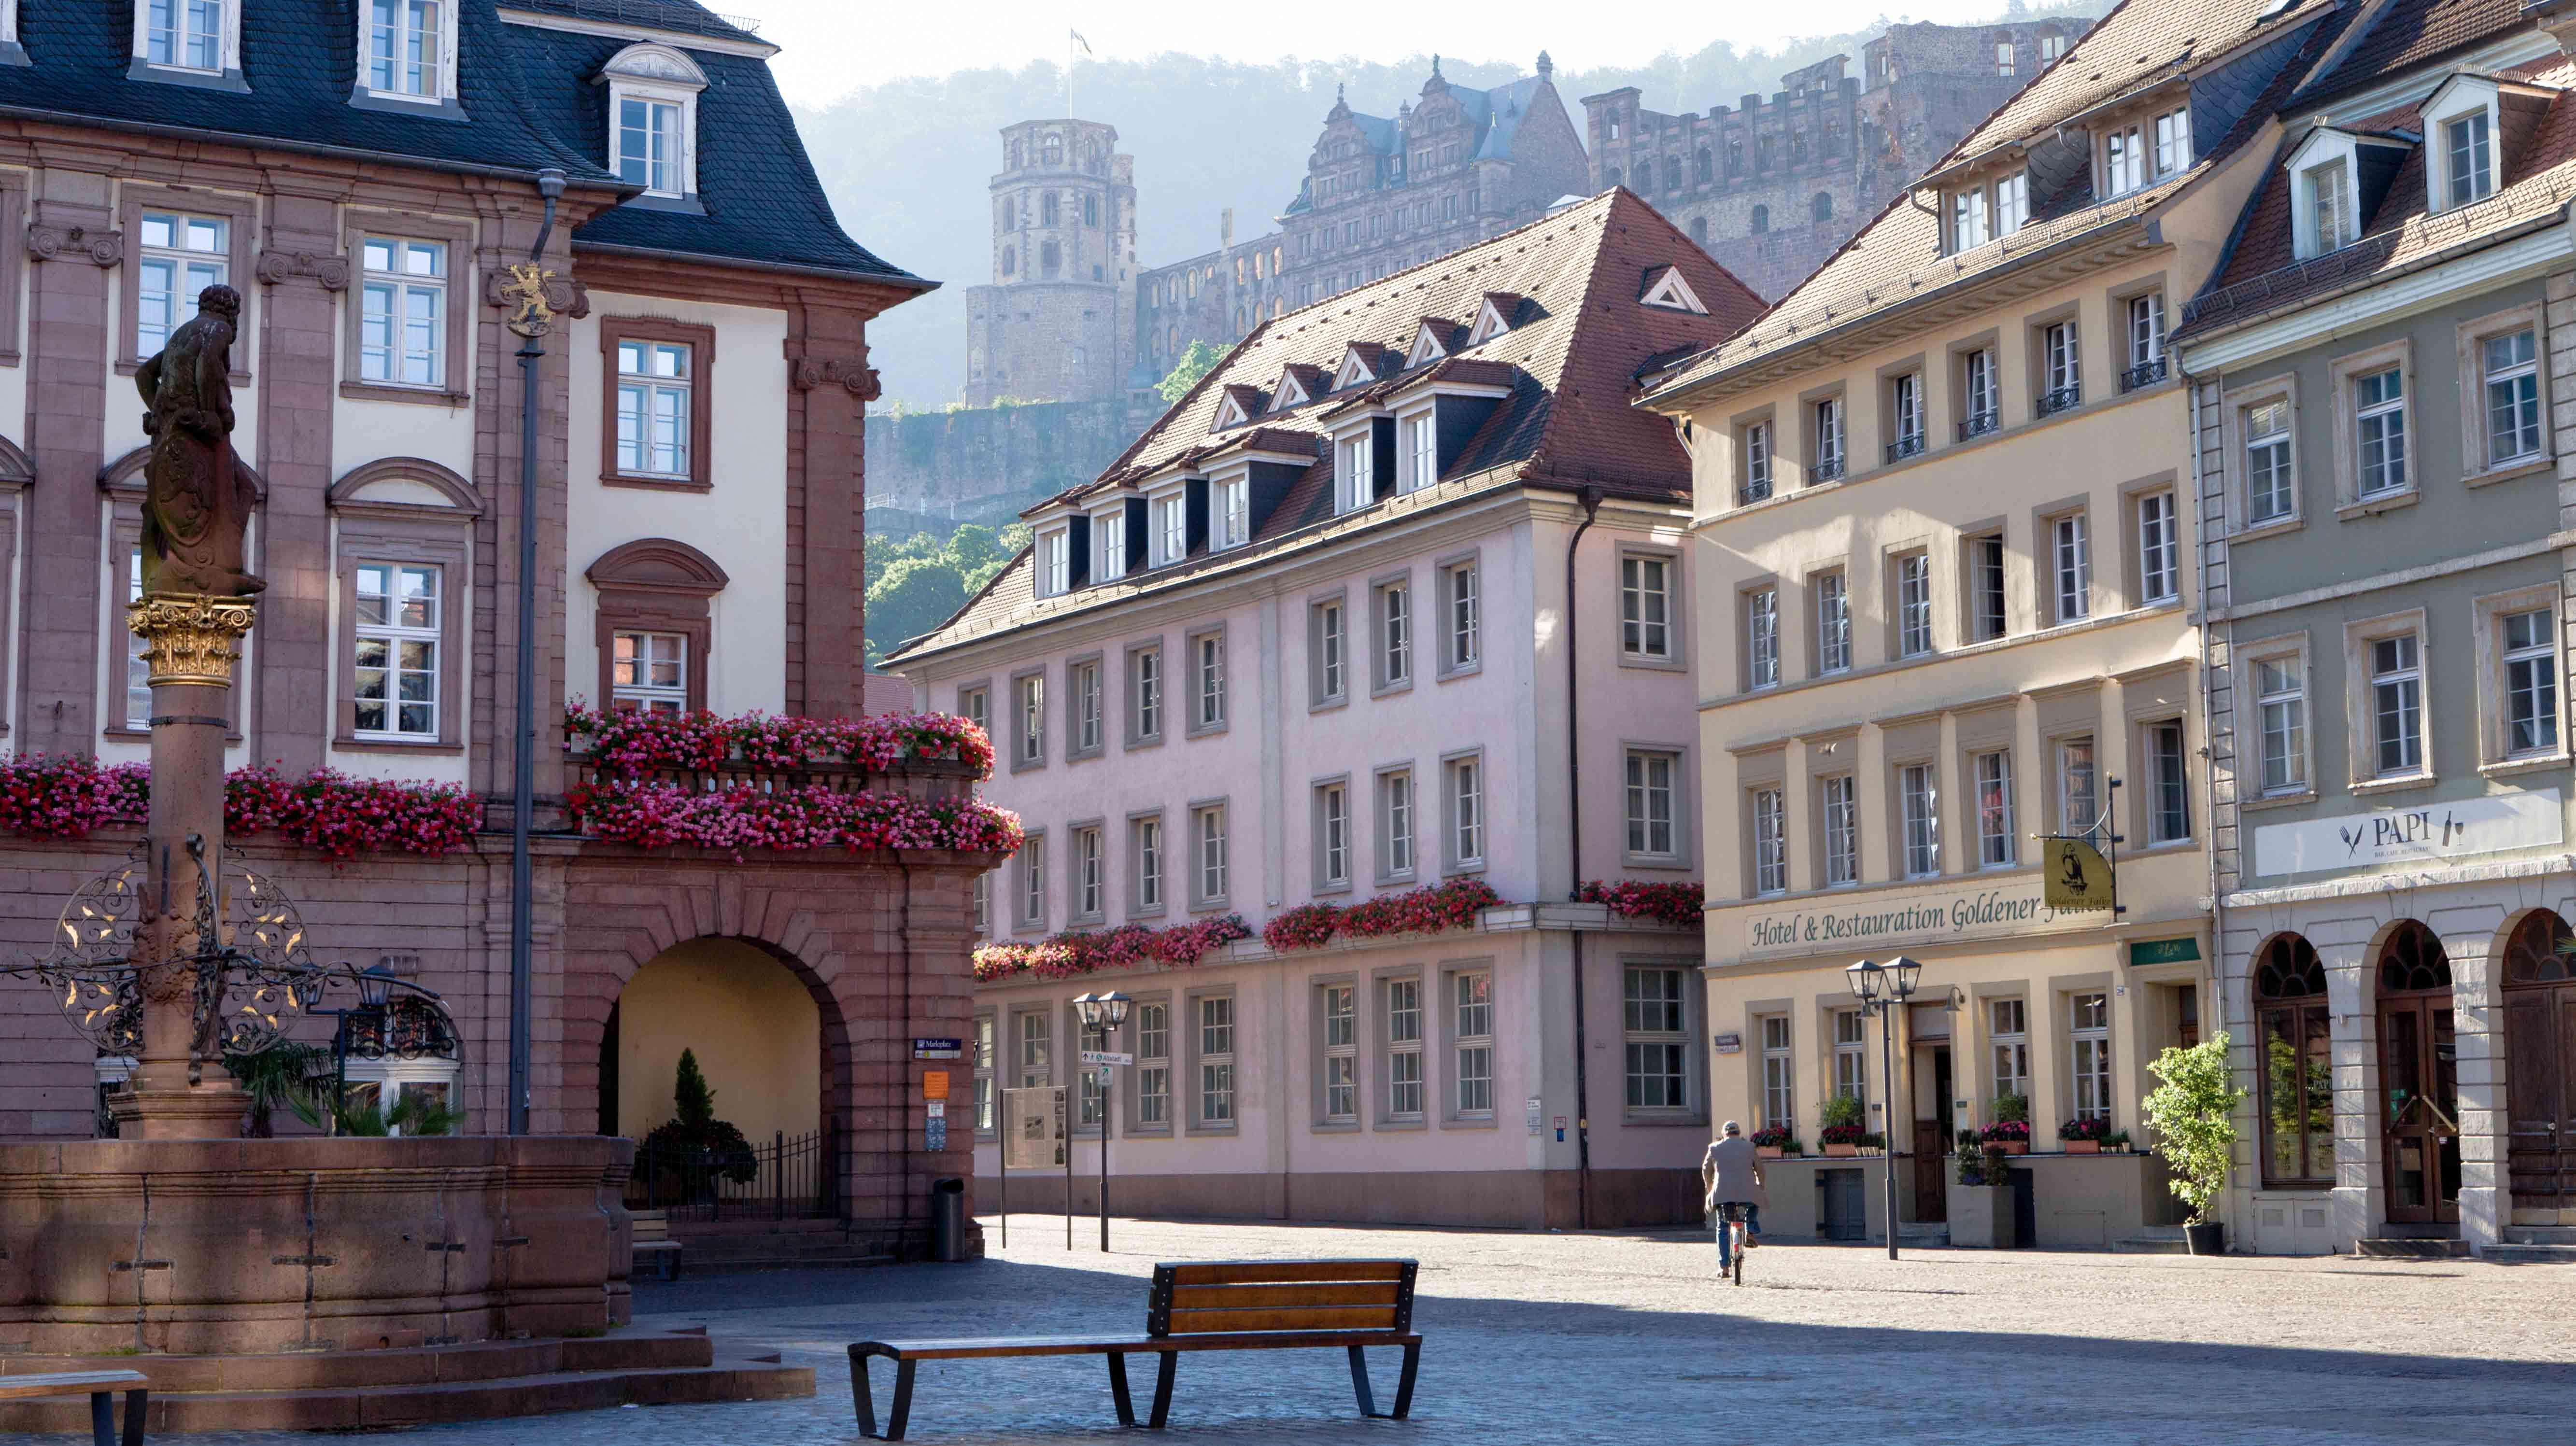 Heidelberg picture